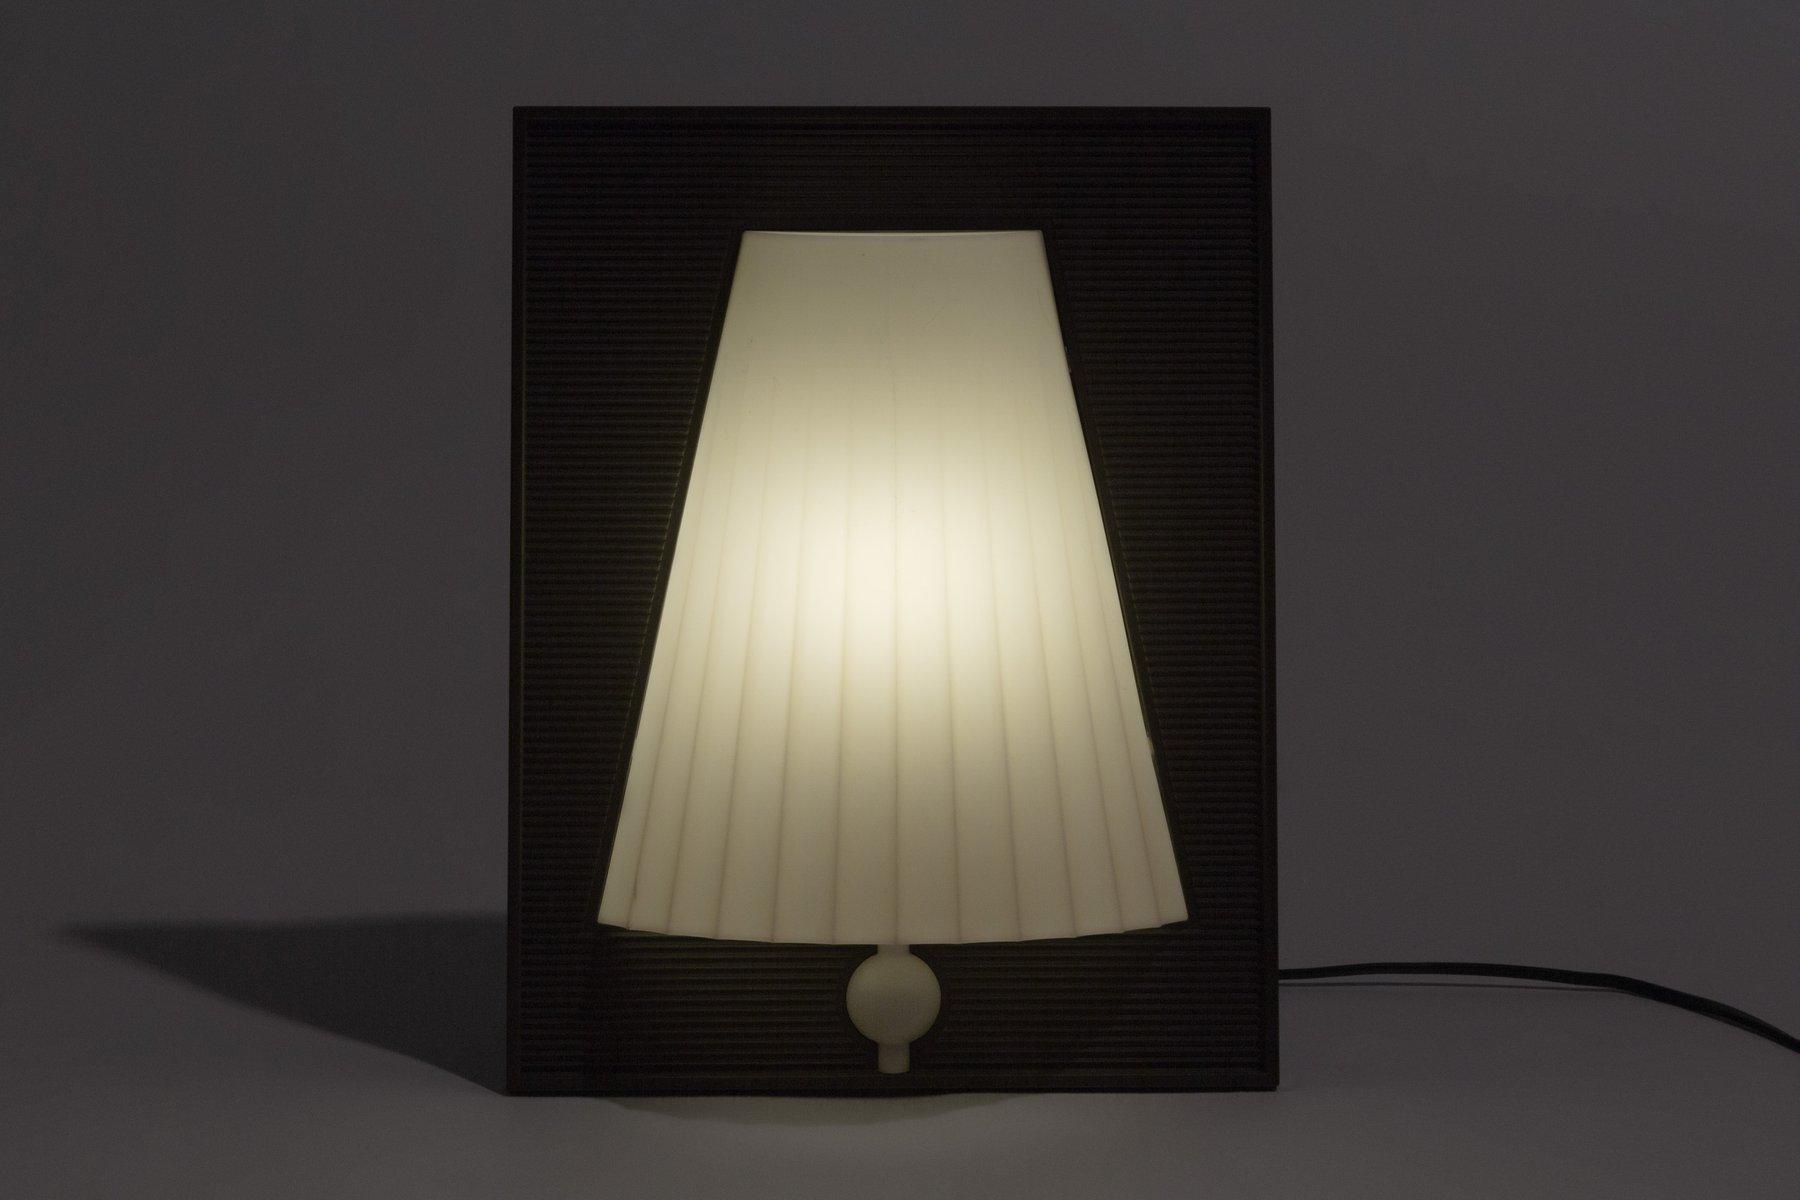 Flos applique tight light wall ceiling flos